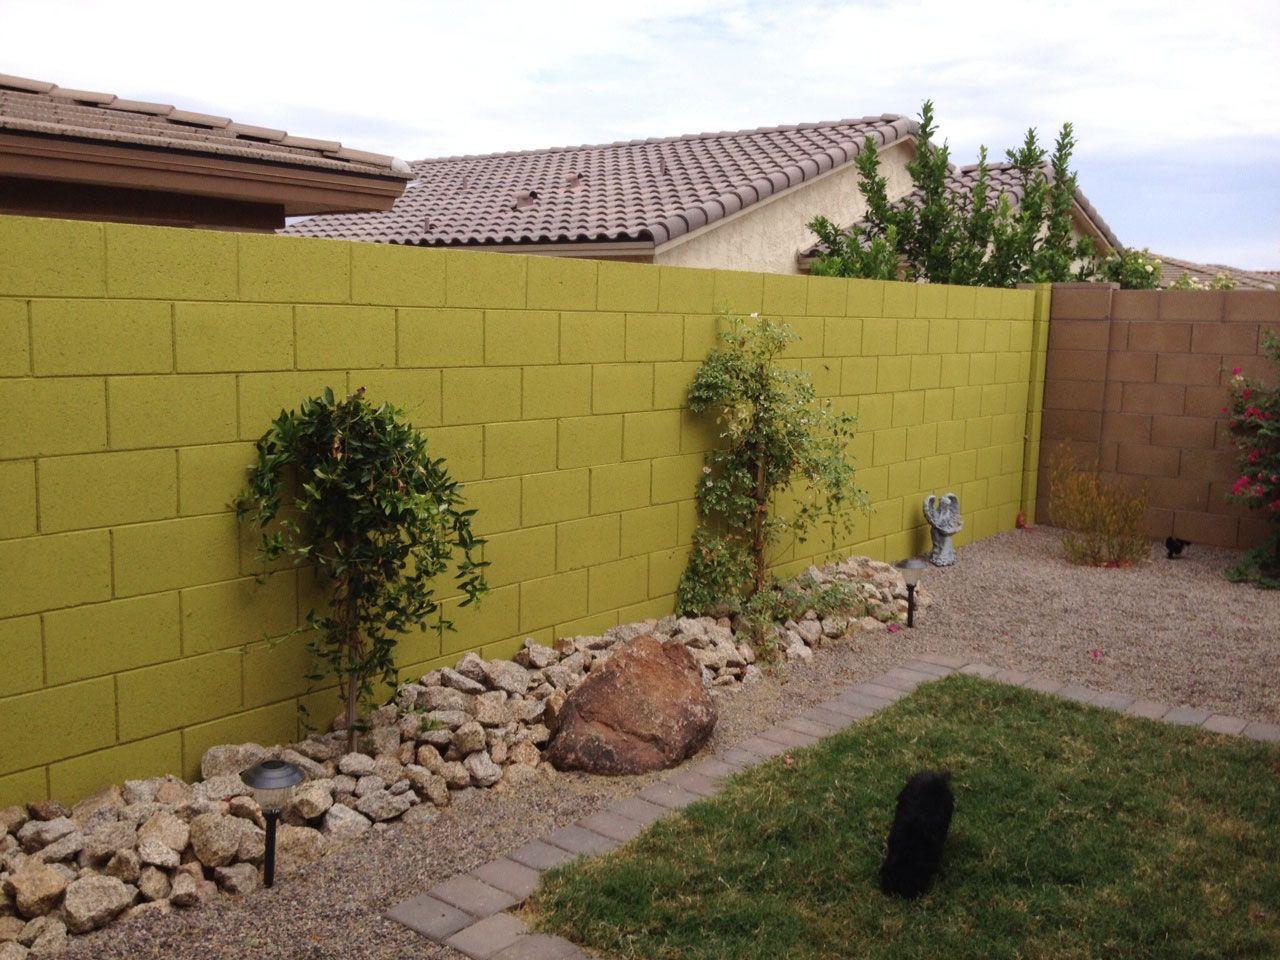 garden cinderblock wall paint - Google Search | cuello mao ...